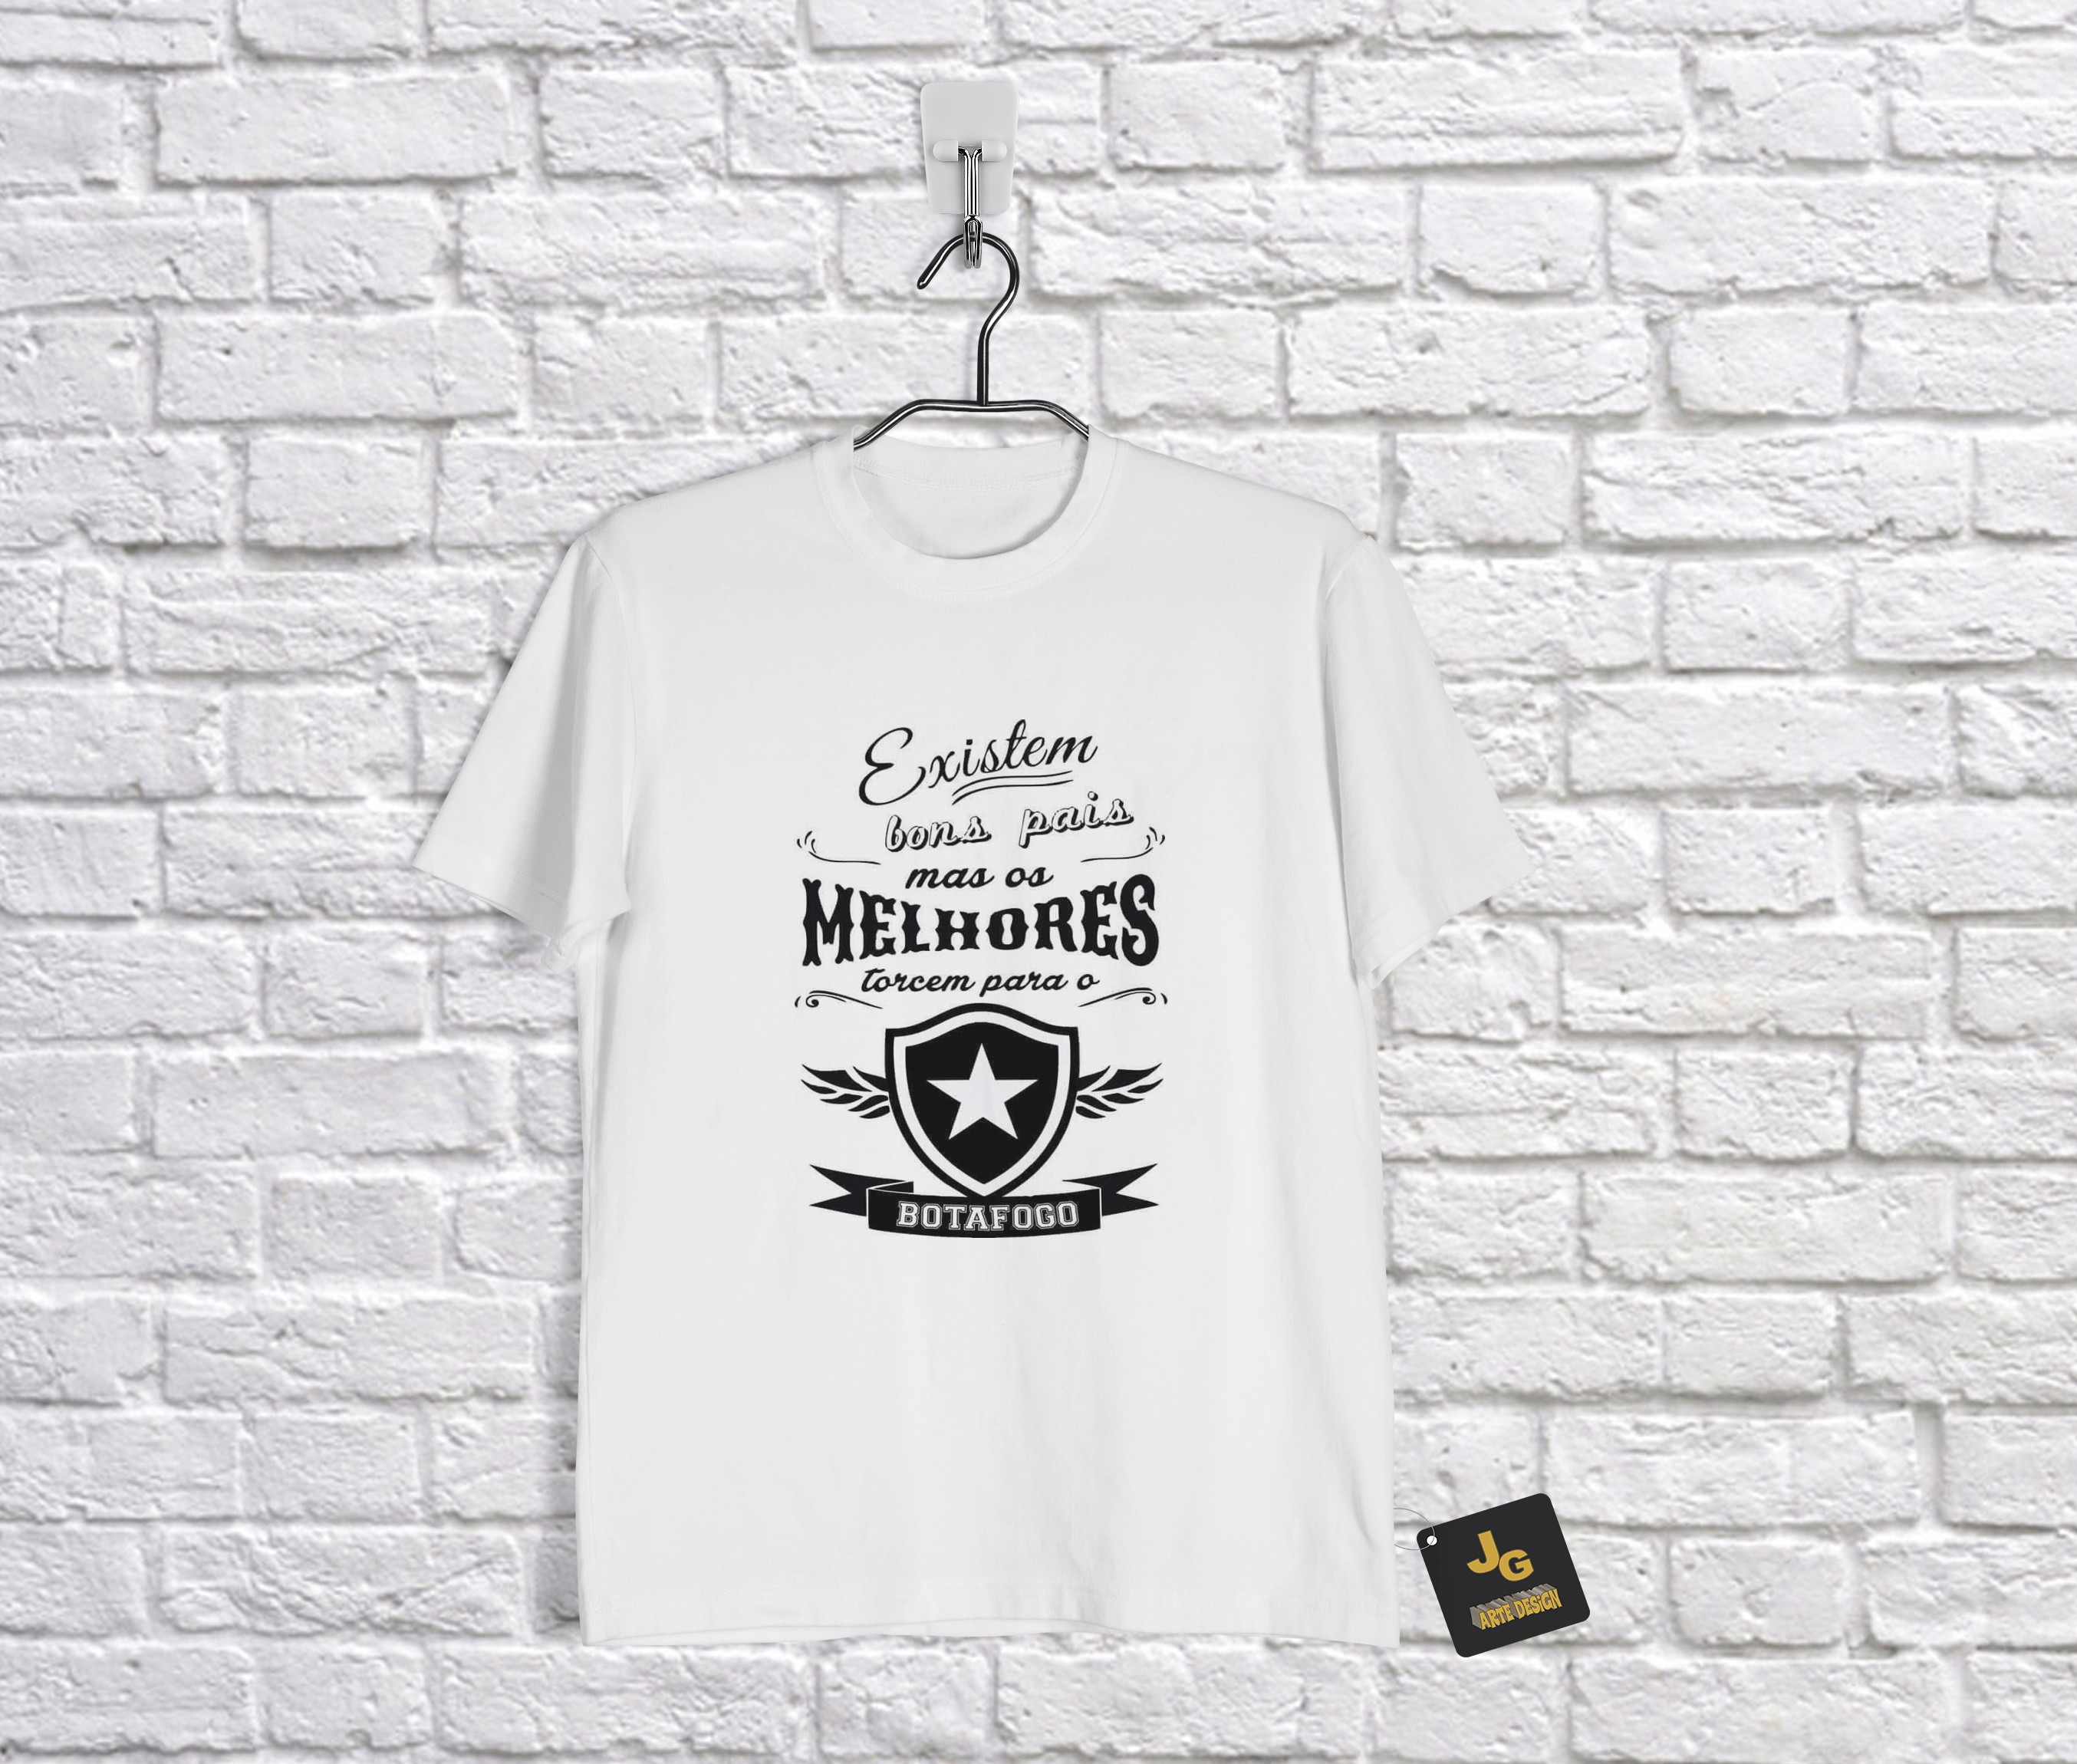 Camiseta Infantil Personalizada Time Botafogo  973984d8a564b